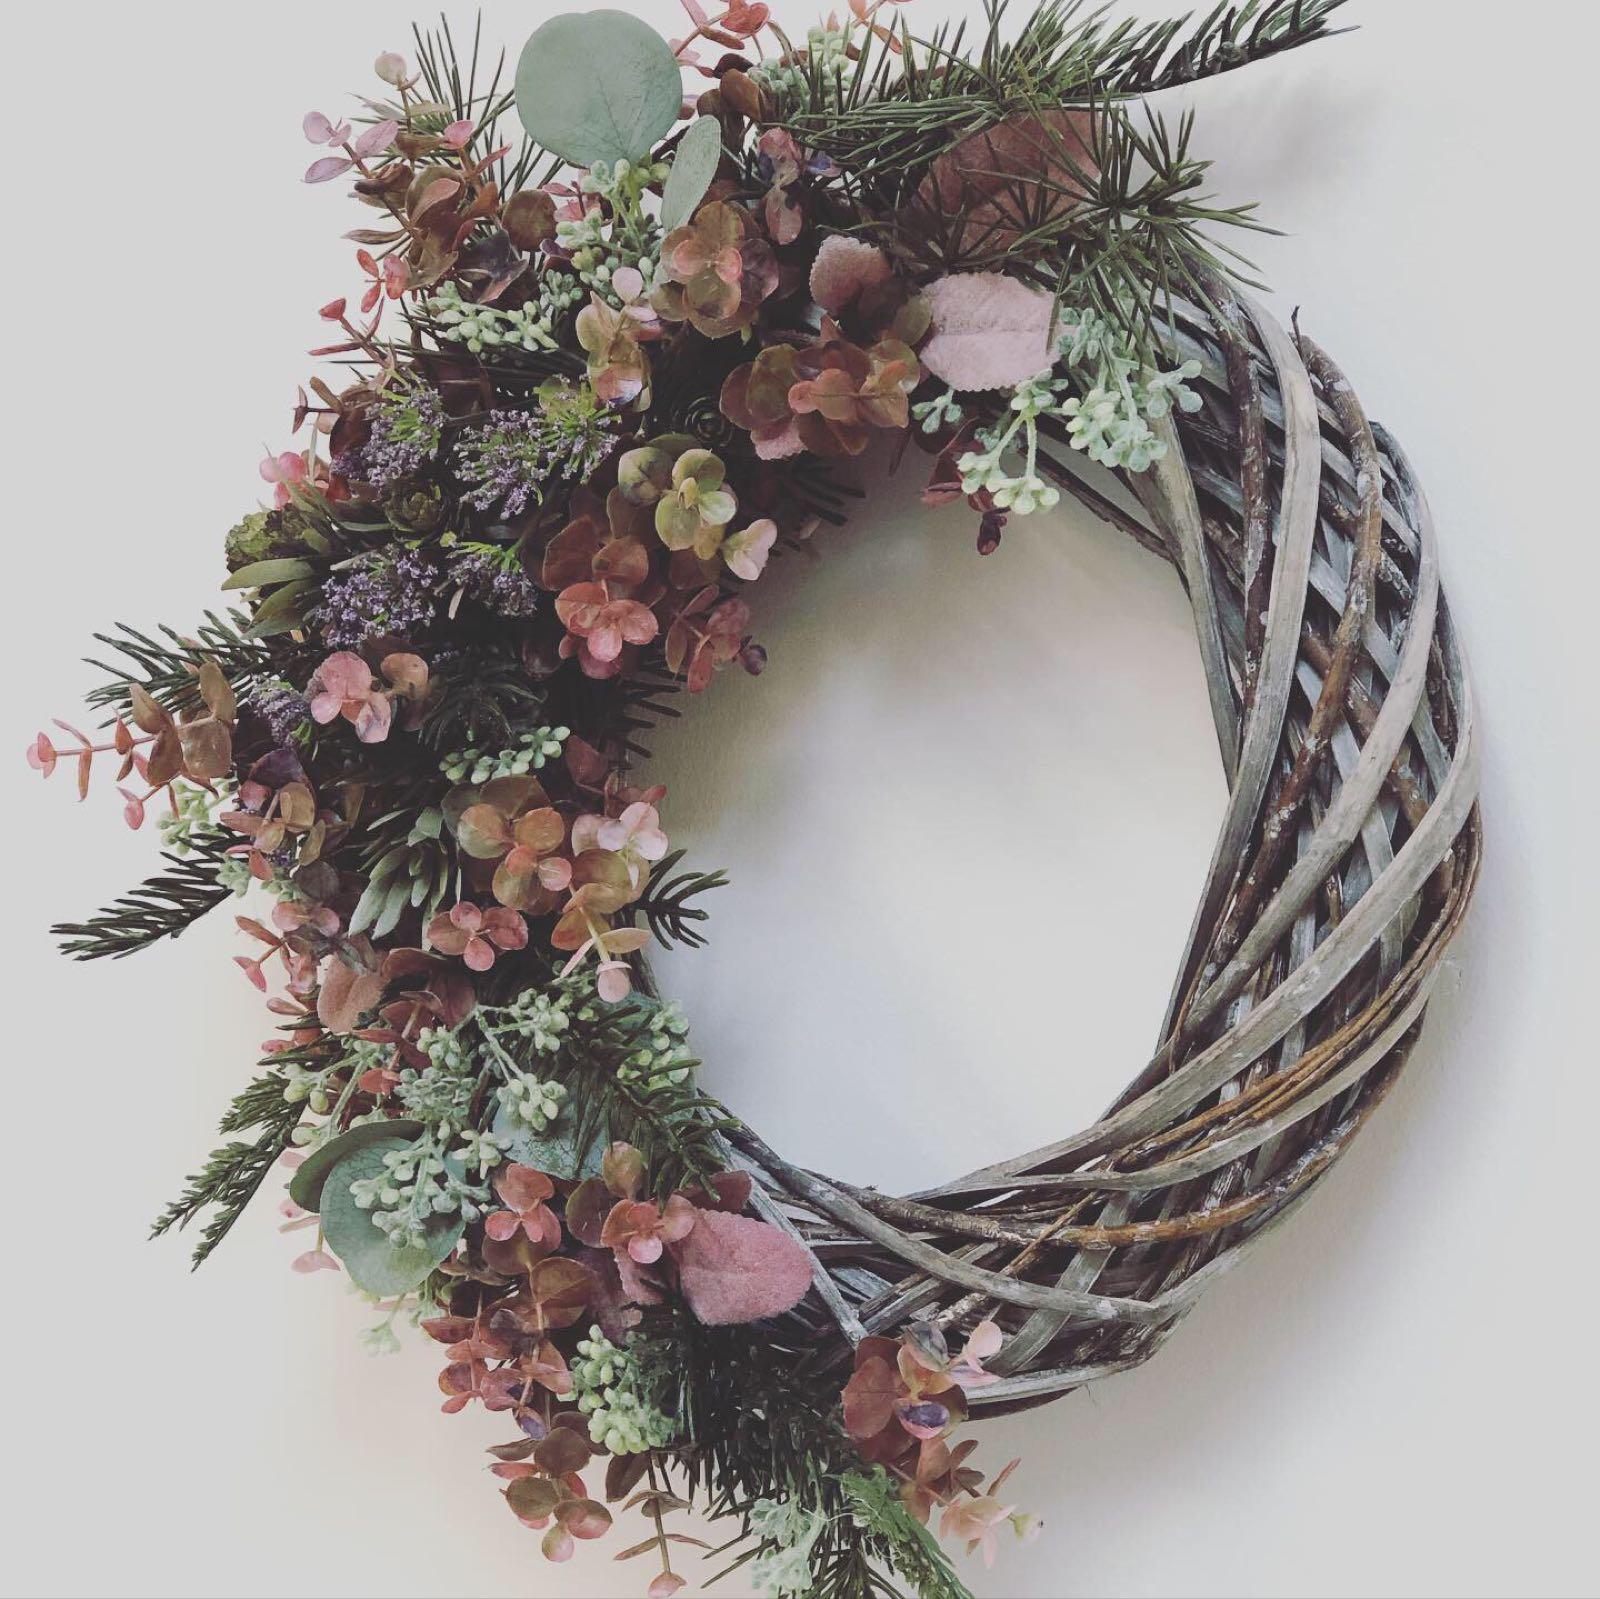 Petals and Peas Skara Scandinavia style wreath 30cm